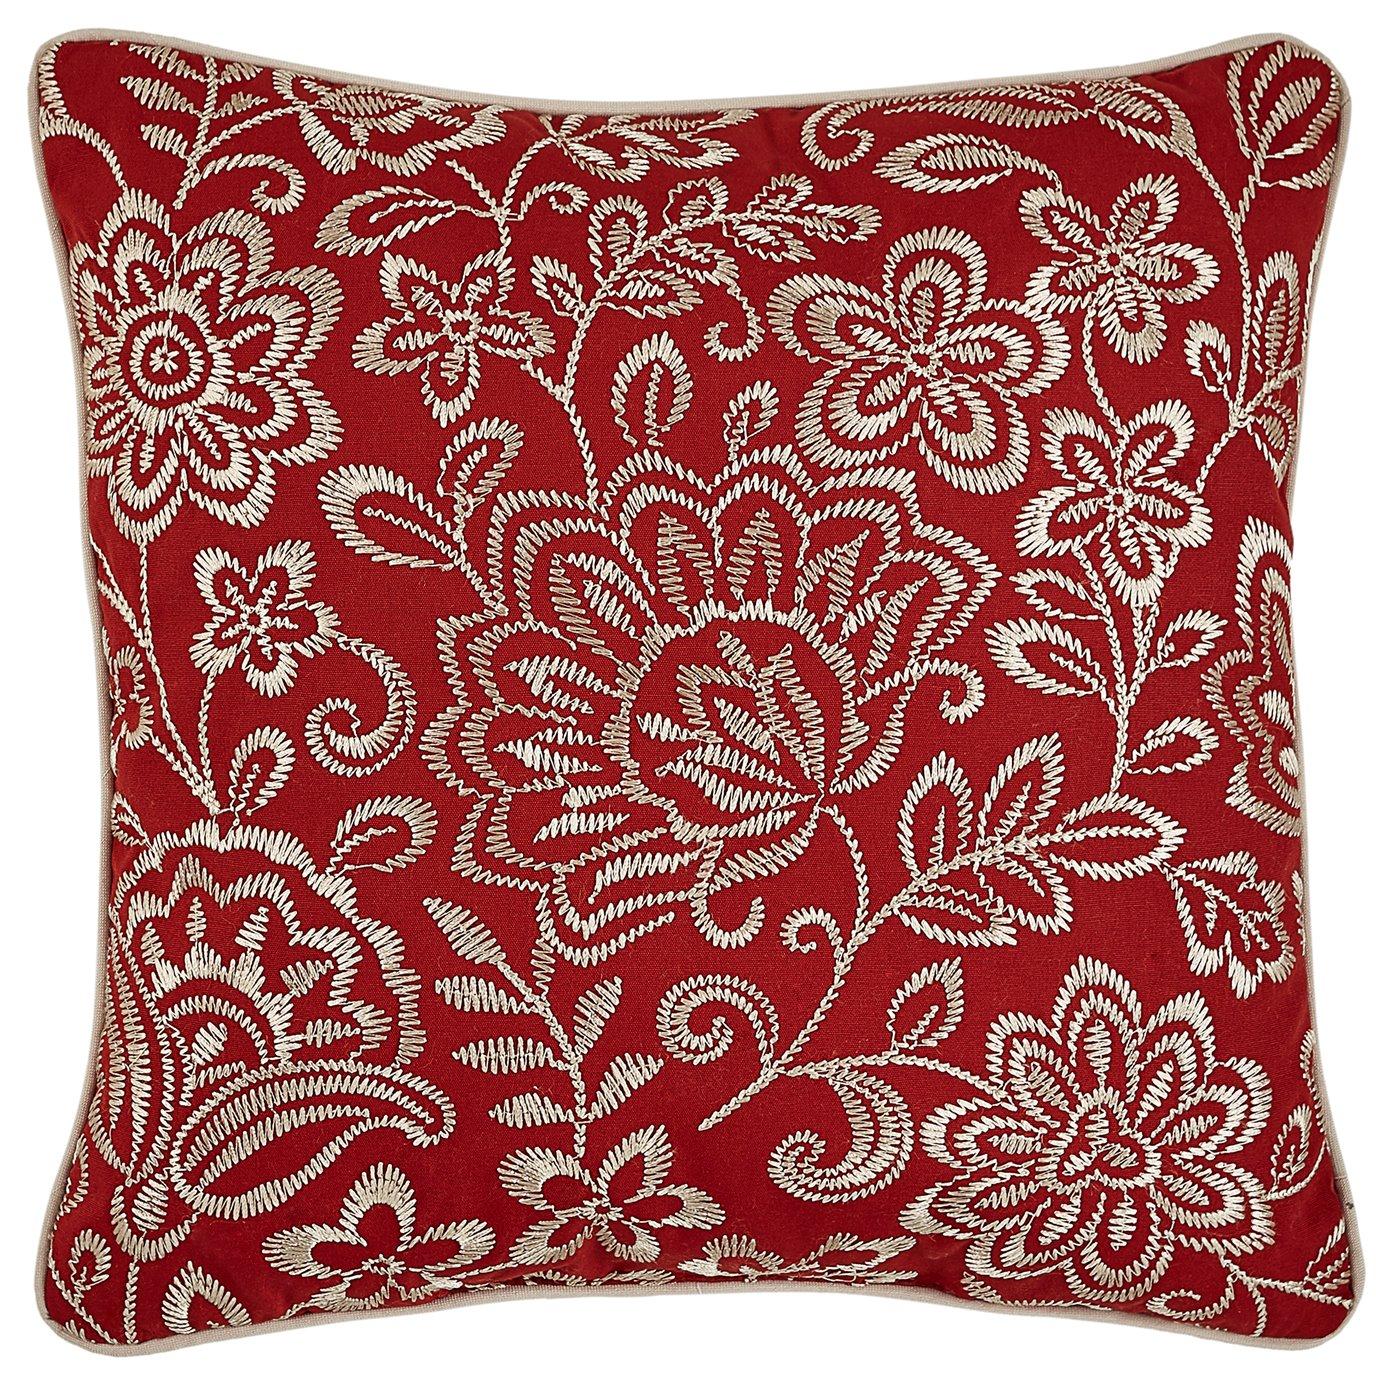 Adriel Square Pillow 18x18